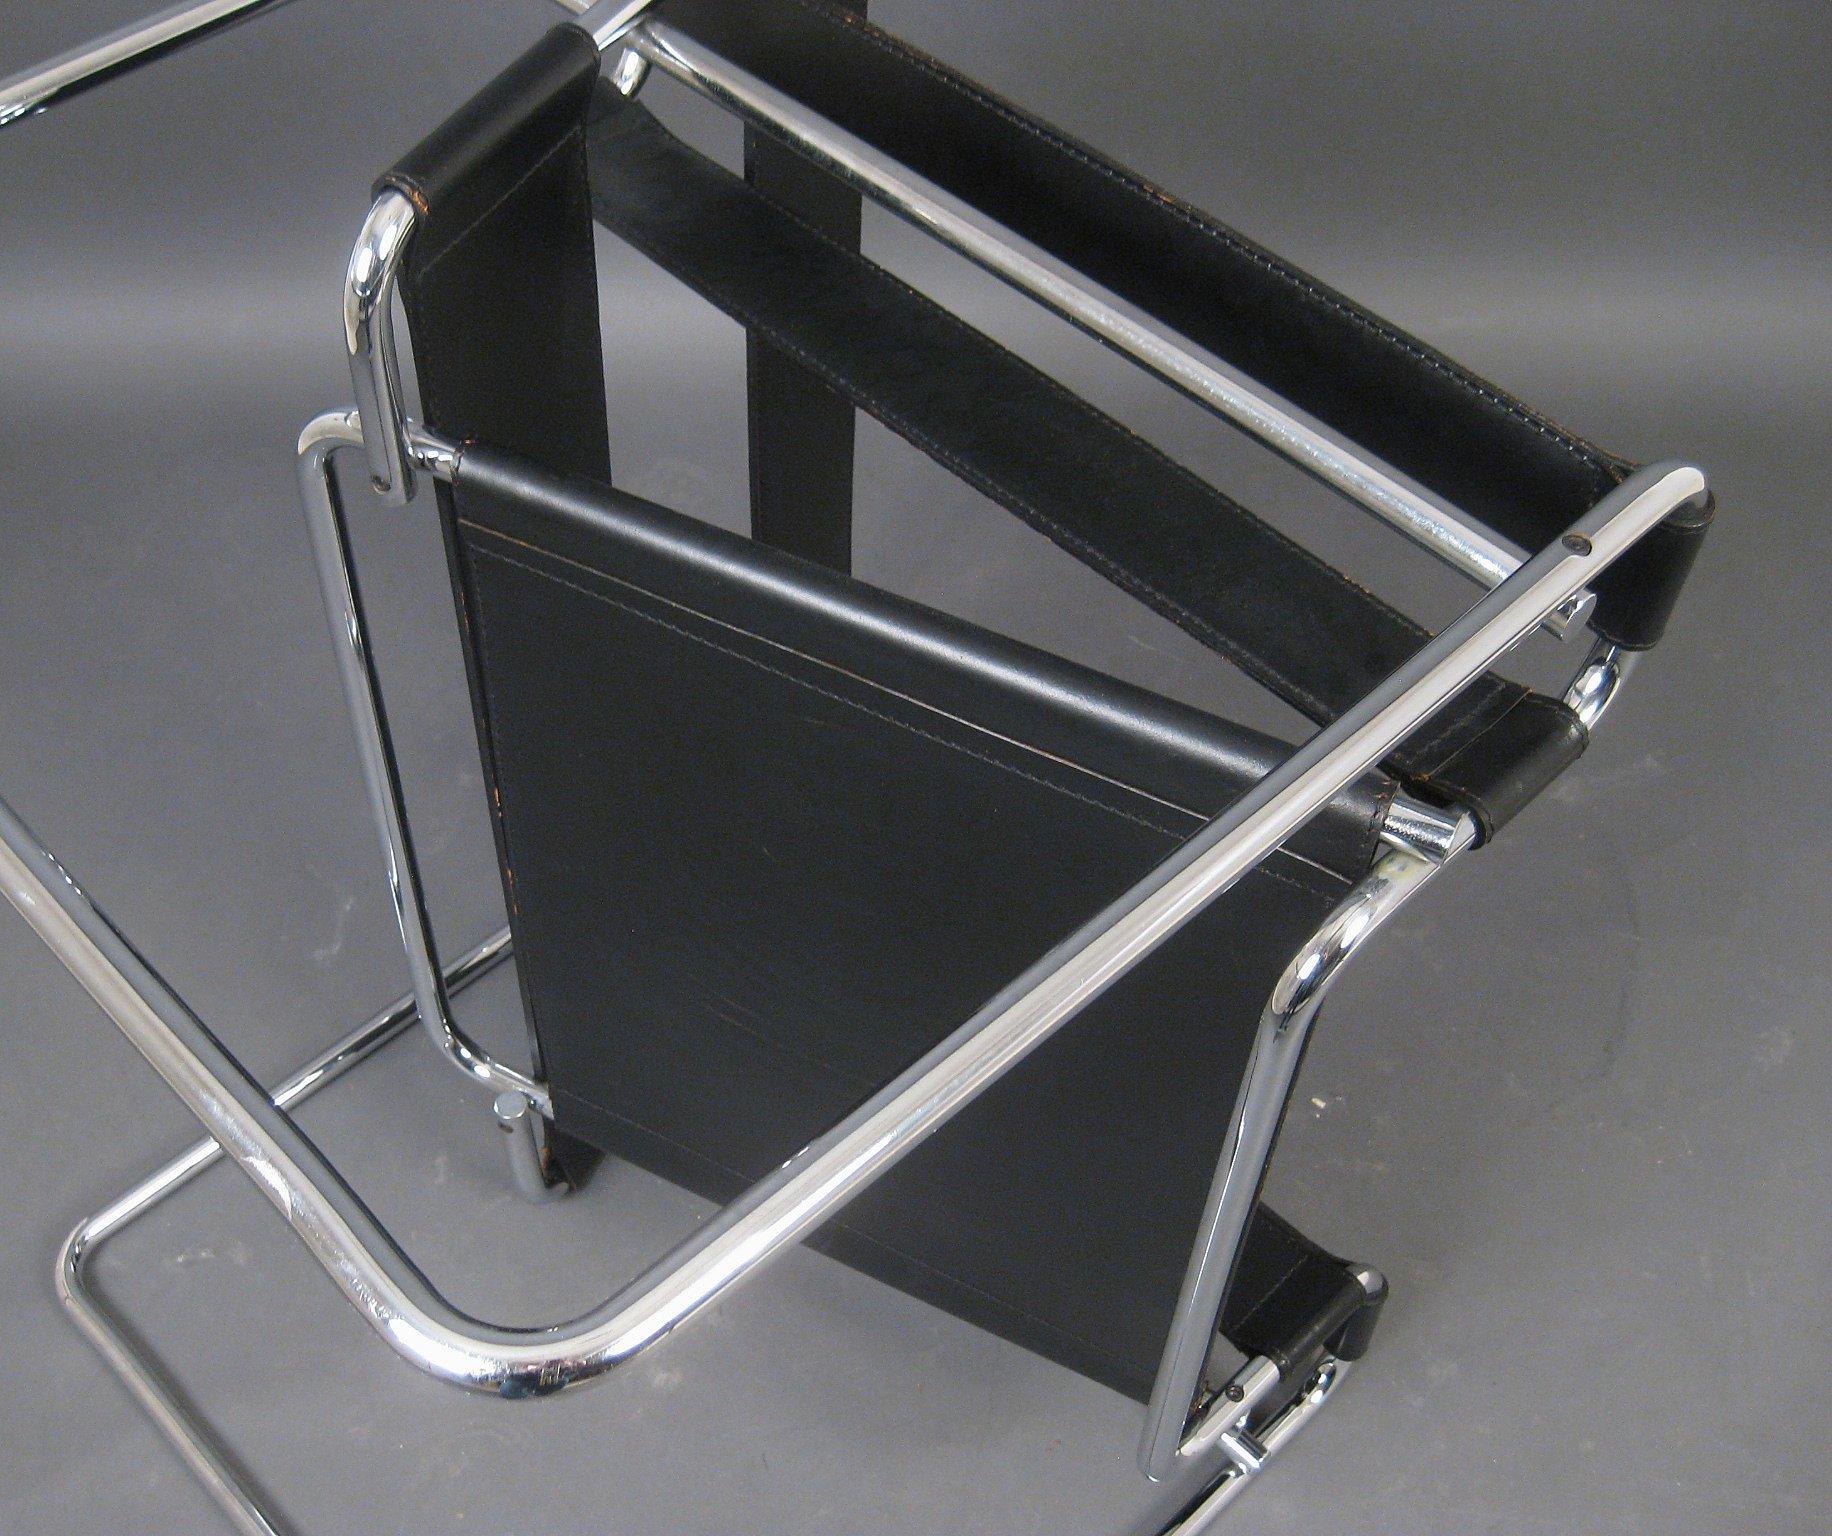 Marcel Breuer, Bauhaus chair model Wassily by Knoll International